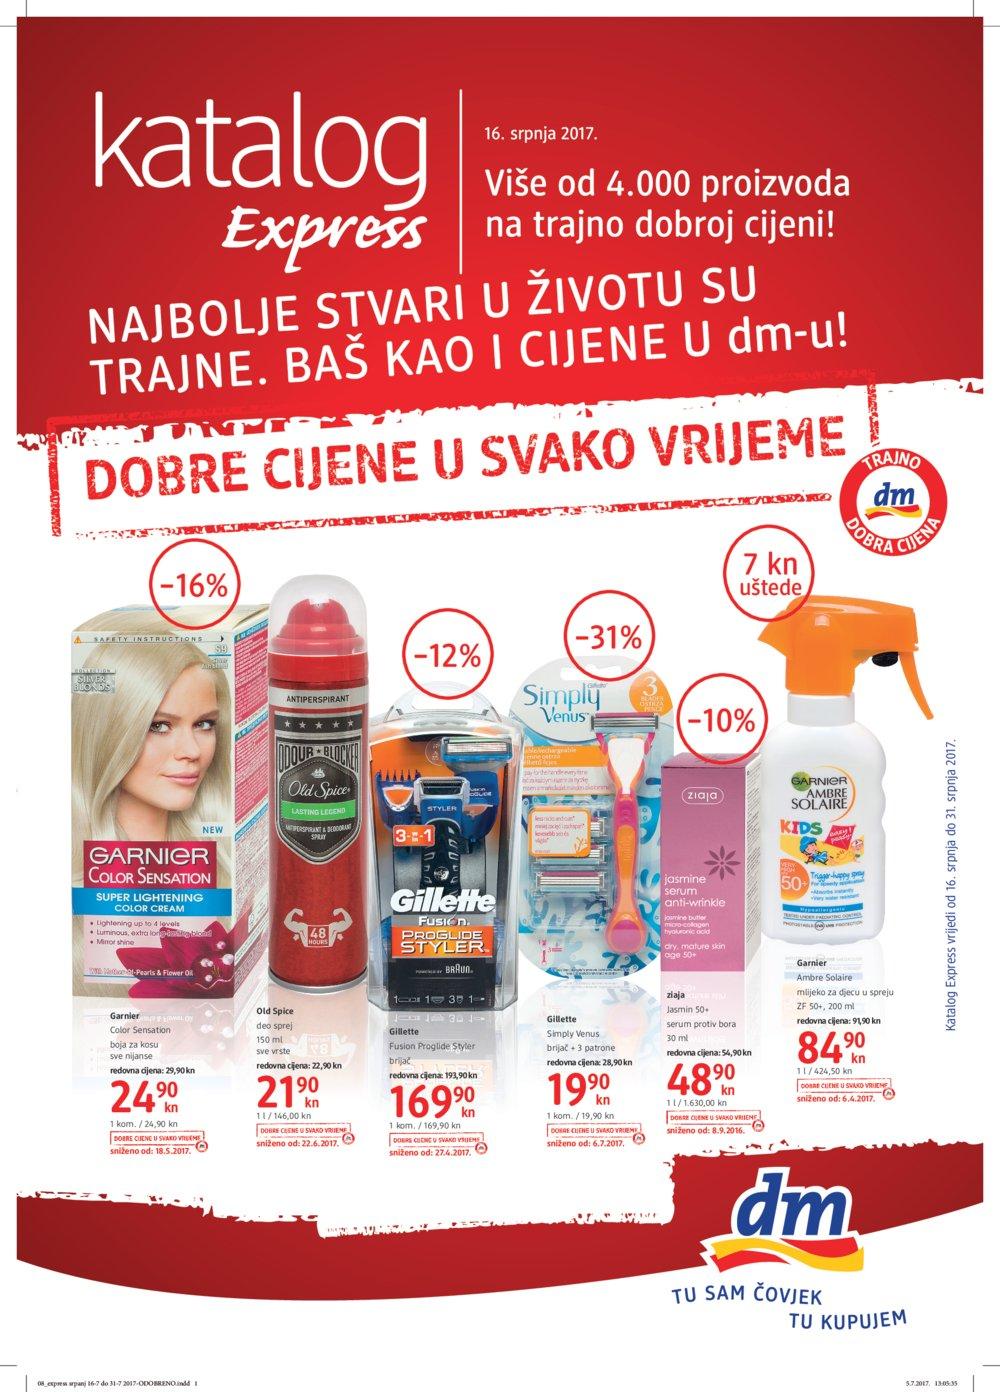 dm katalog Express 16.07.-31.07.2017.